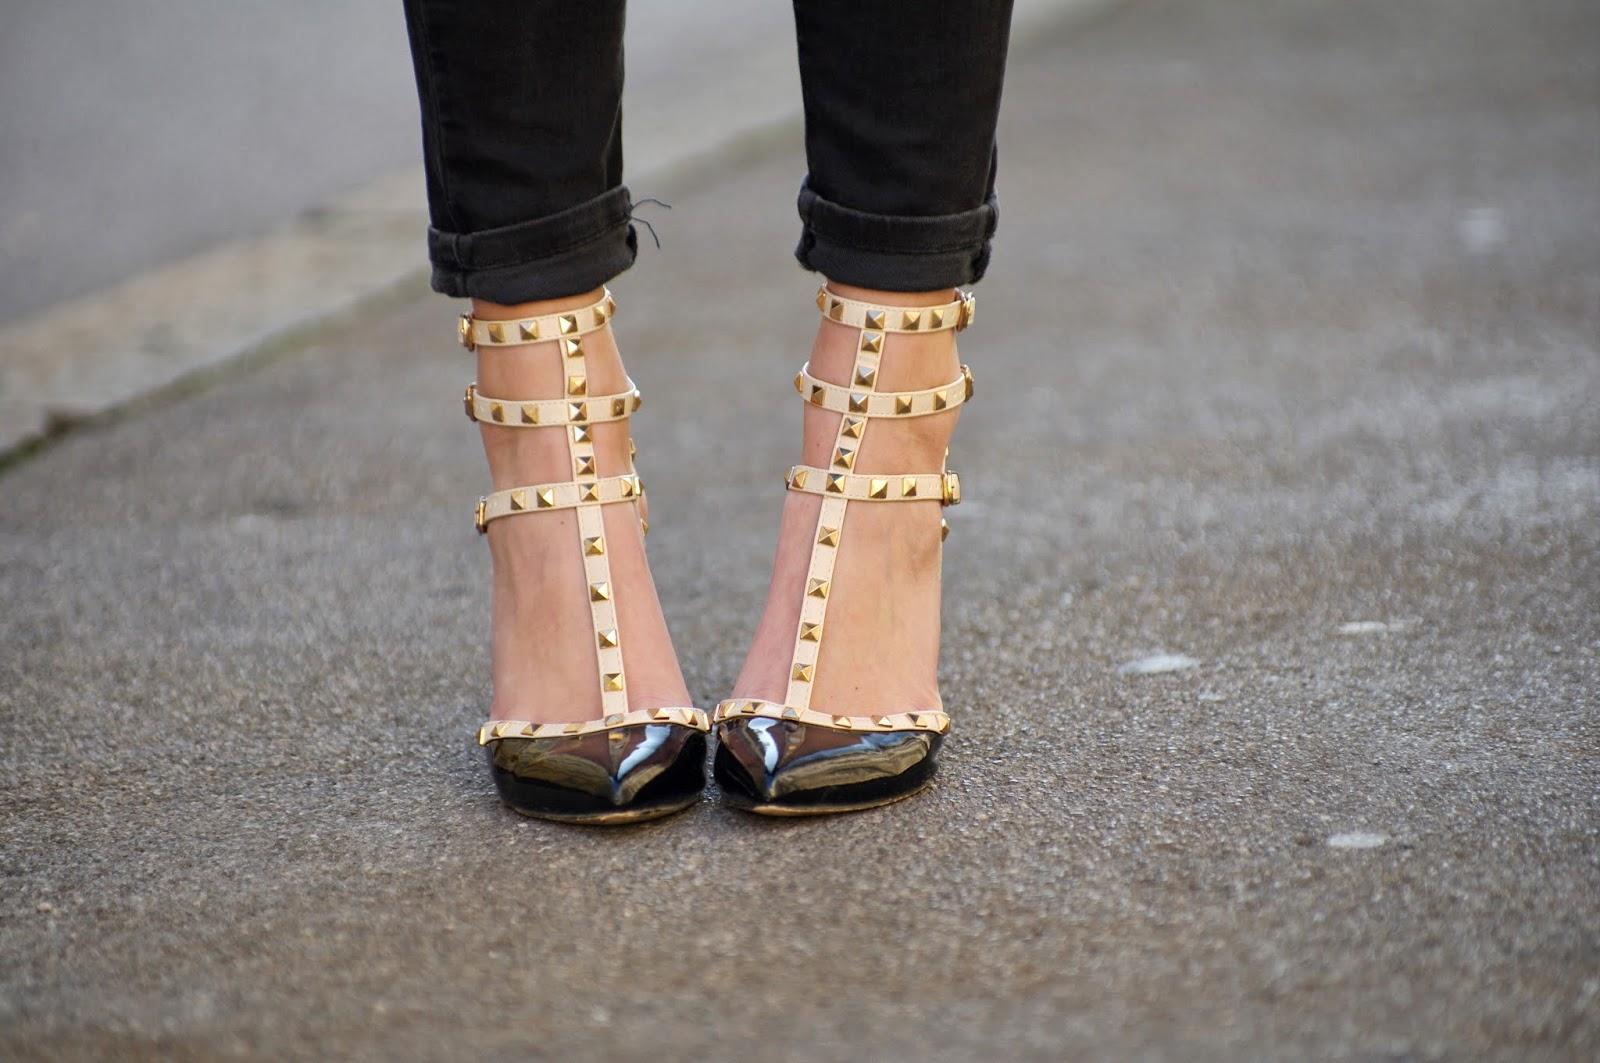 valentino rockstud lookalikes replica ebay, style blogger, fashion blog blogger, slovenski blogerji, modni blog